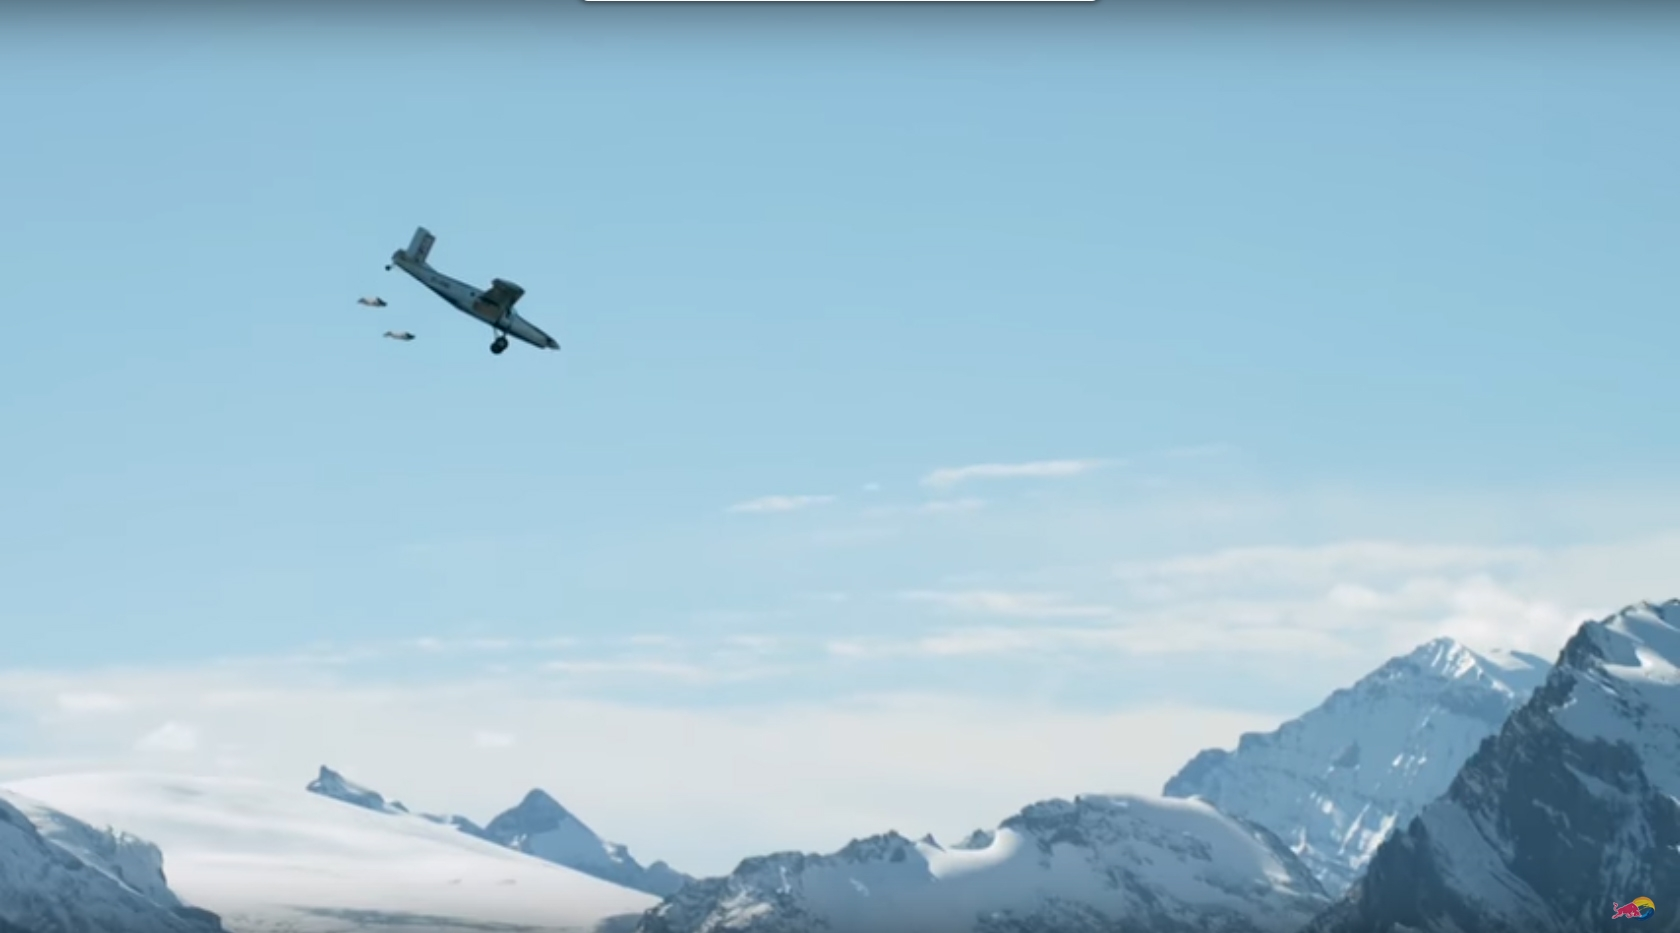 Видео: Двама французи се качиха в самолет по време на полет